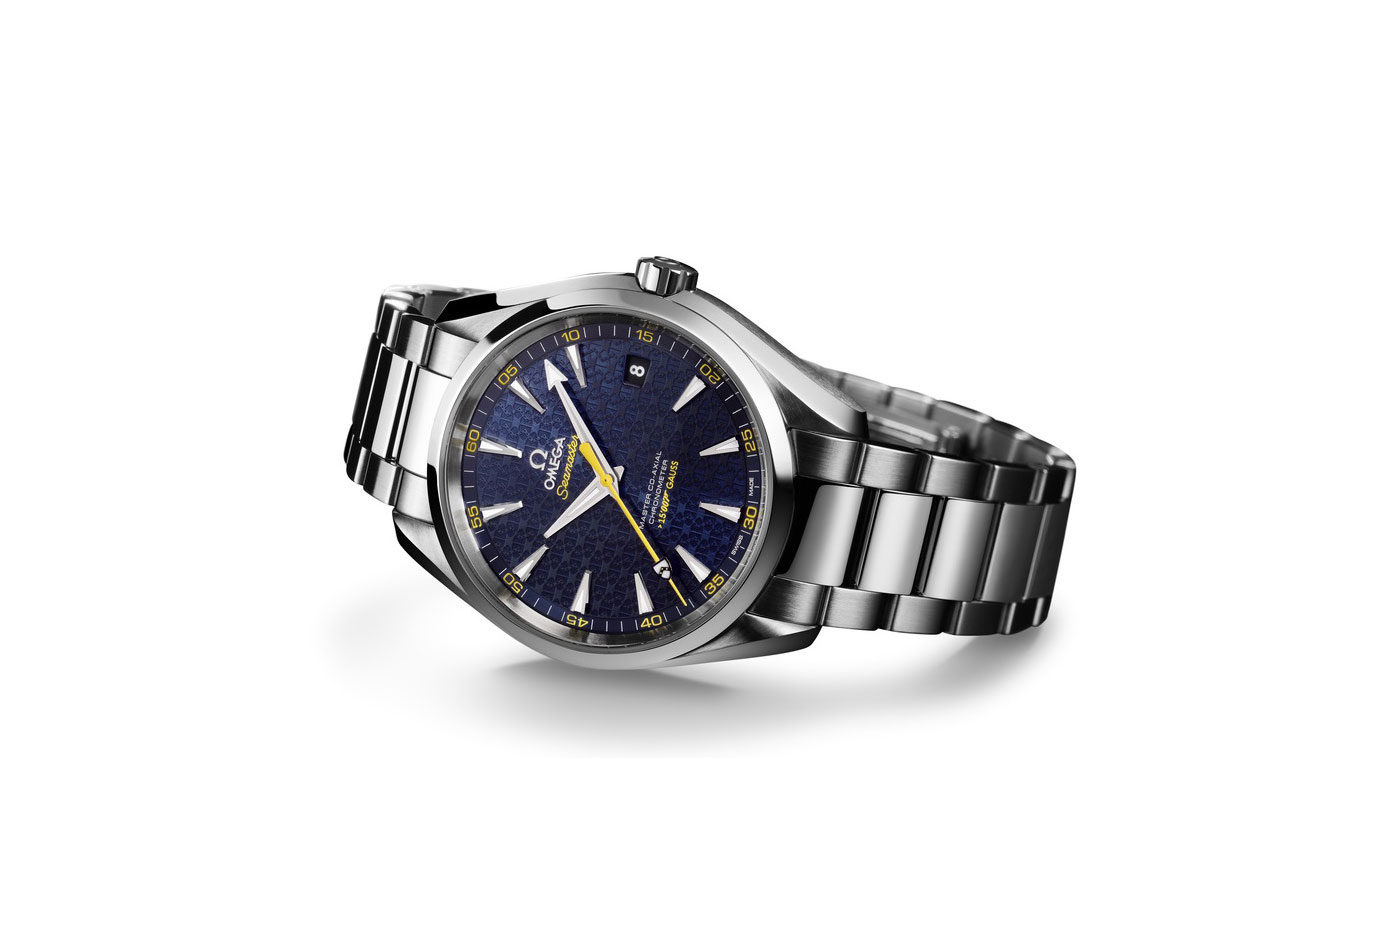 OMEGA Unveils its Seamaster Aqua Terra for James Bond in 'Spectre'